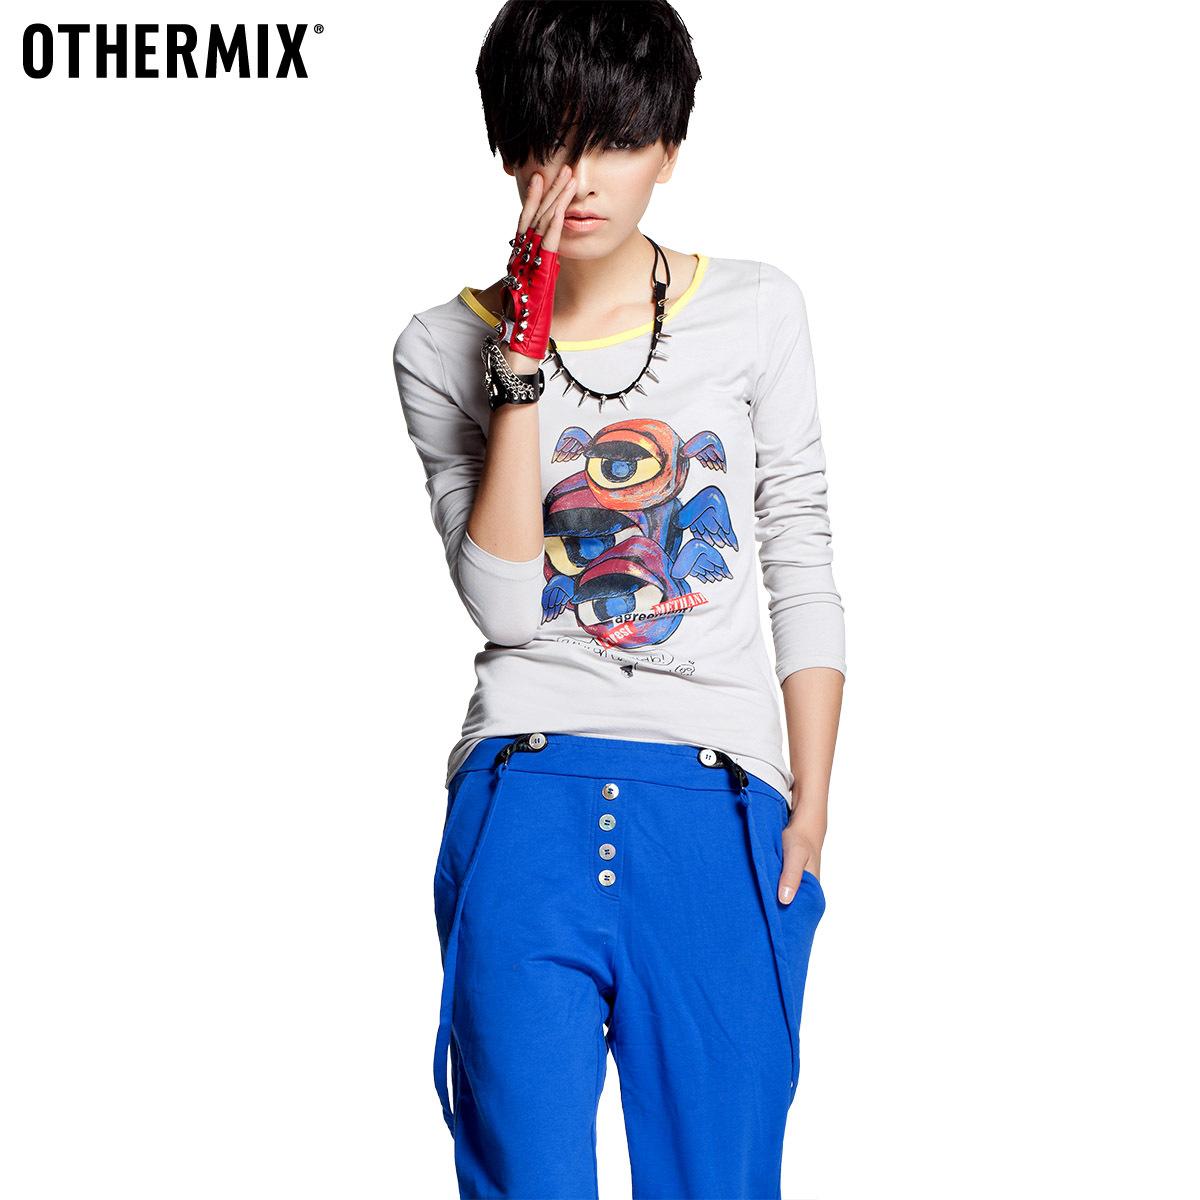 Othermix autumn new arrival long-sleeve T-shirt Women 2012 trend women's 12ma043008f(China (Mainland))